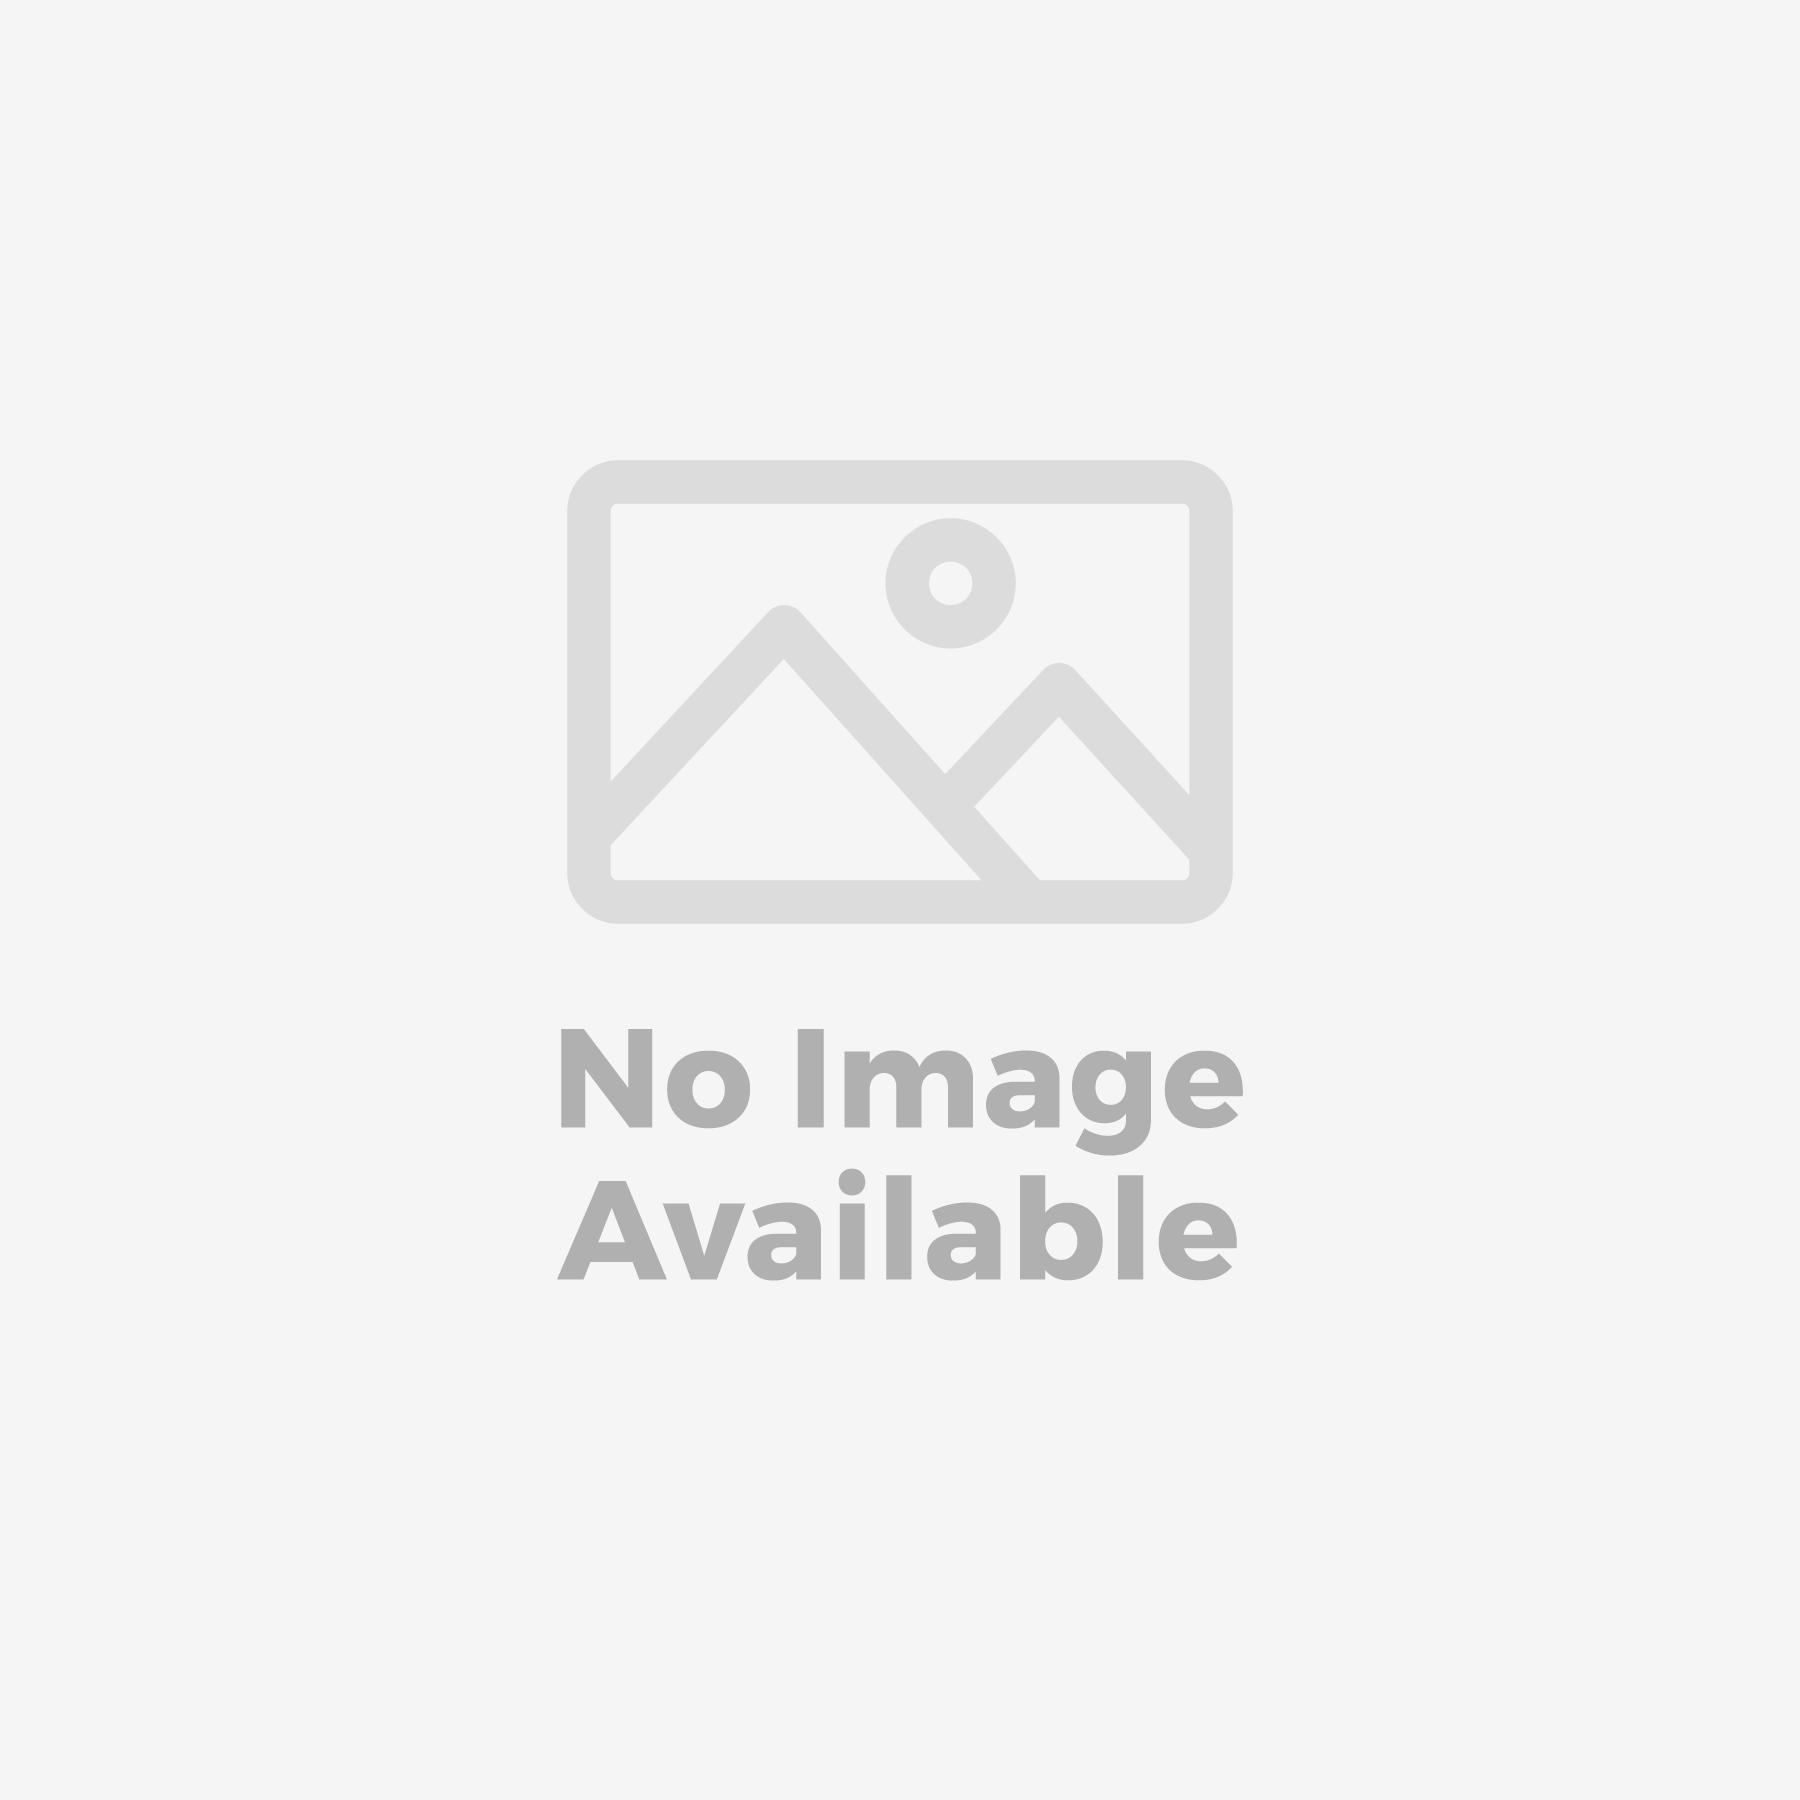 MILO RED GLASS TEALIGHT HOLDER